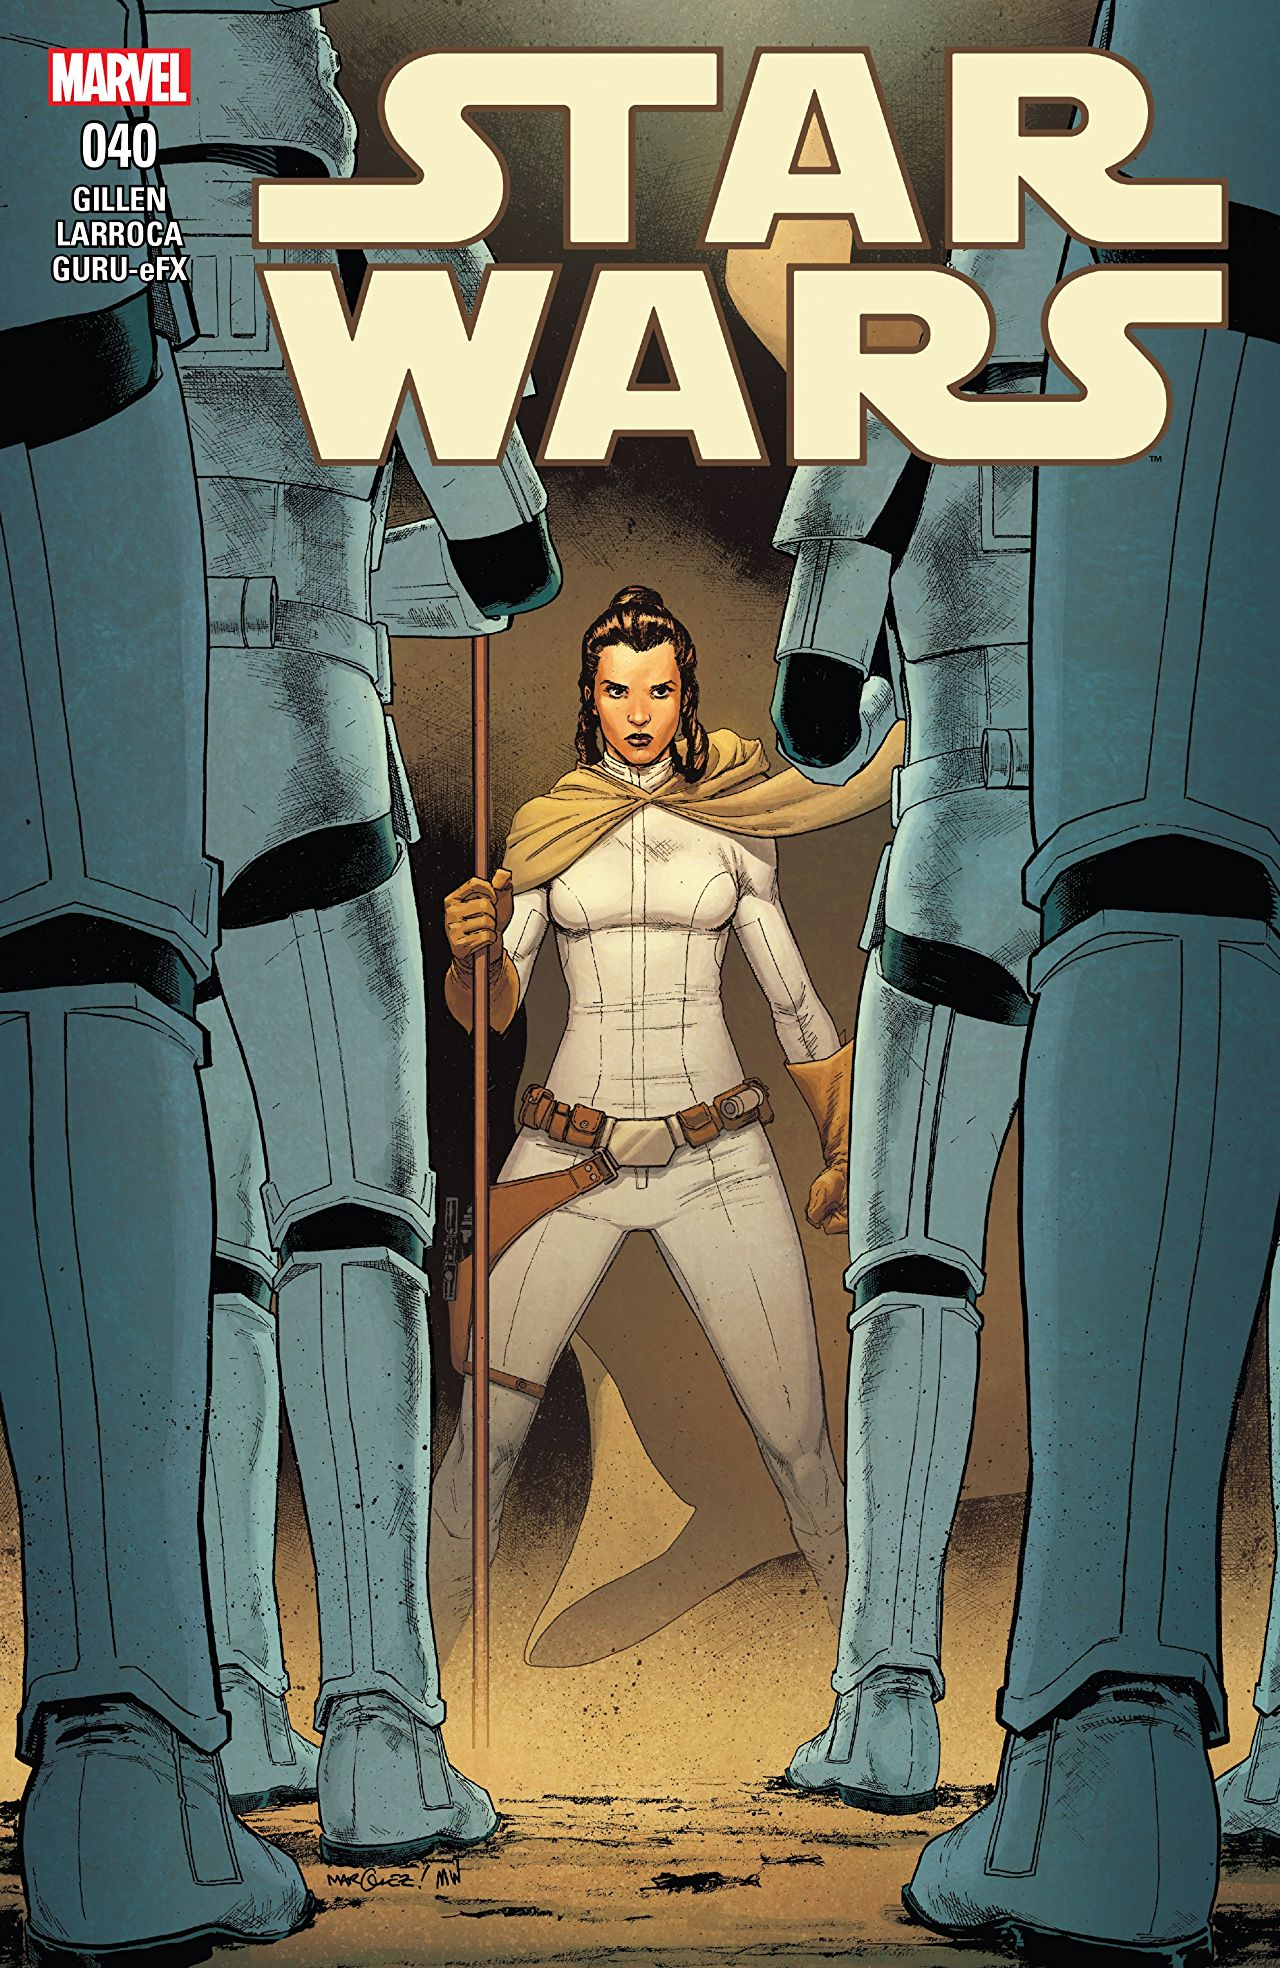 Star Wars #40